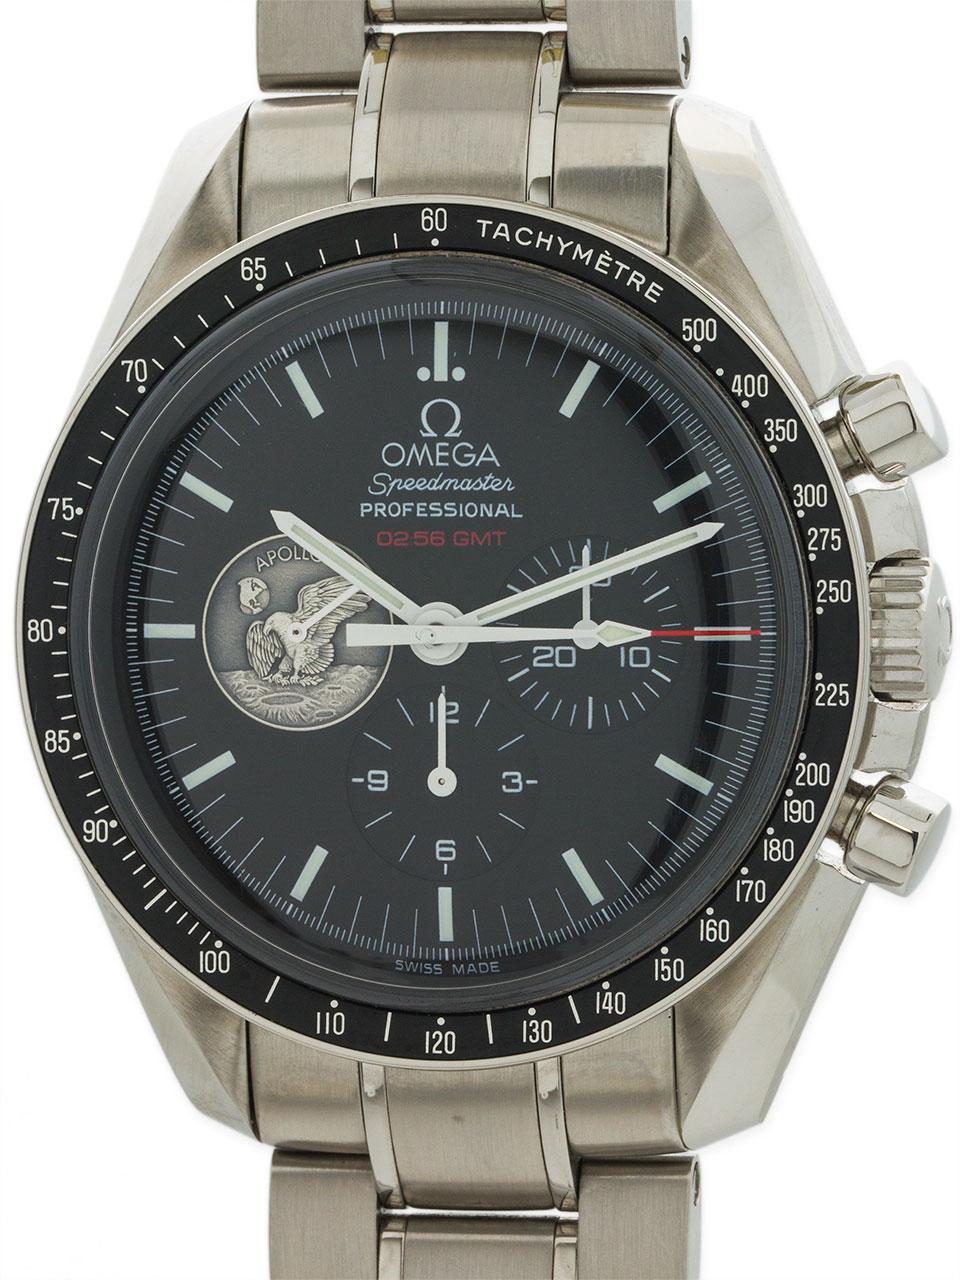 Omega Speedmaster Apollo XI Anniversary Edition